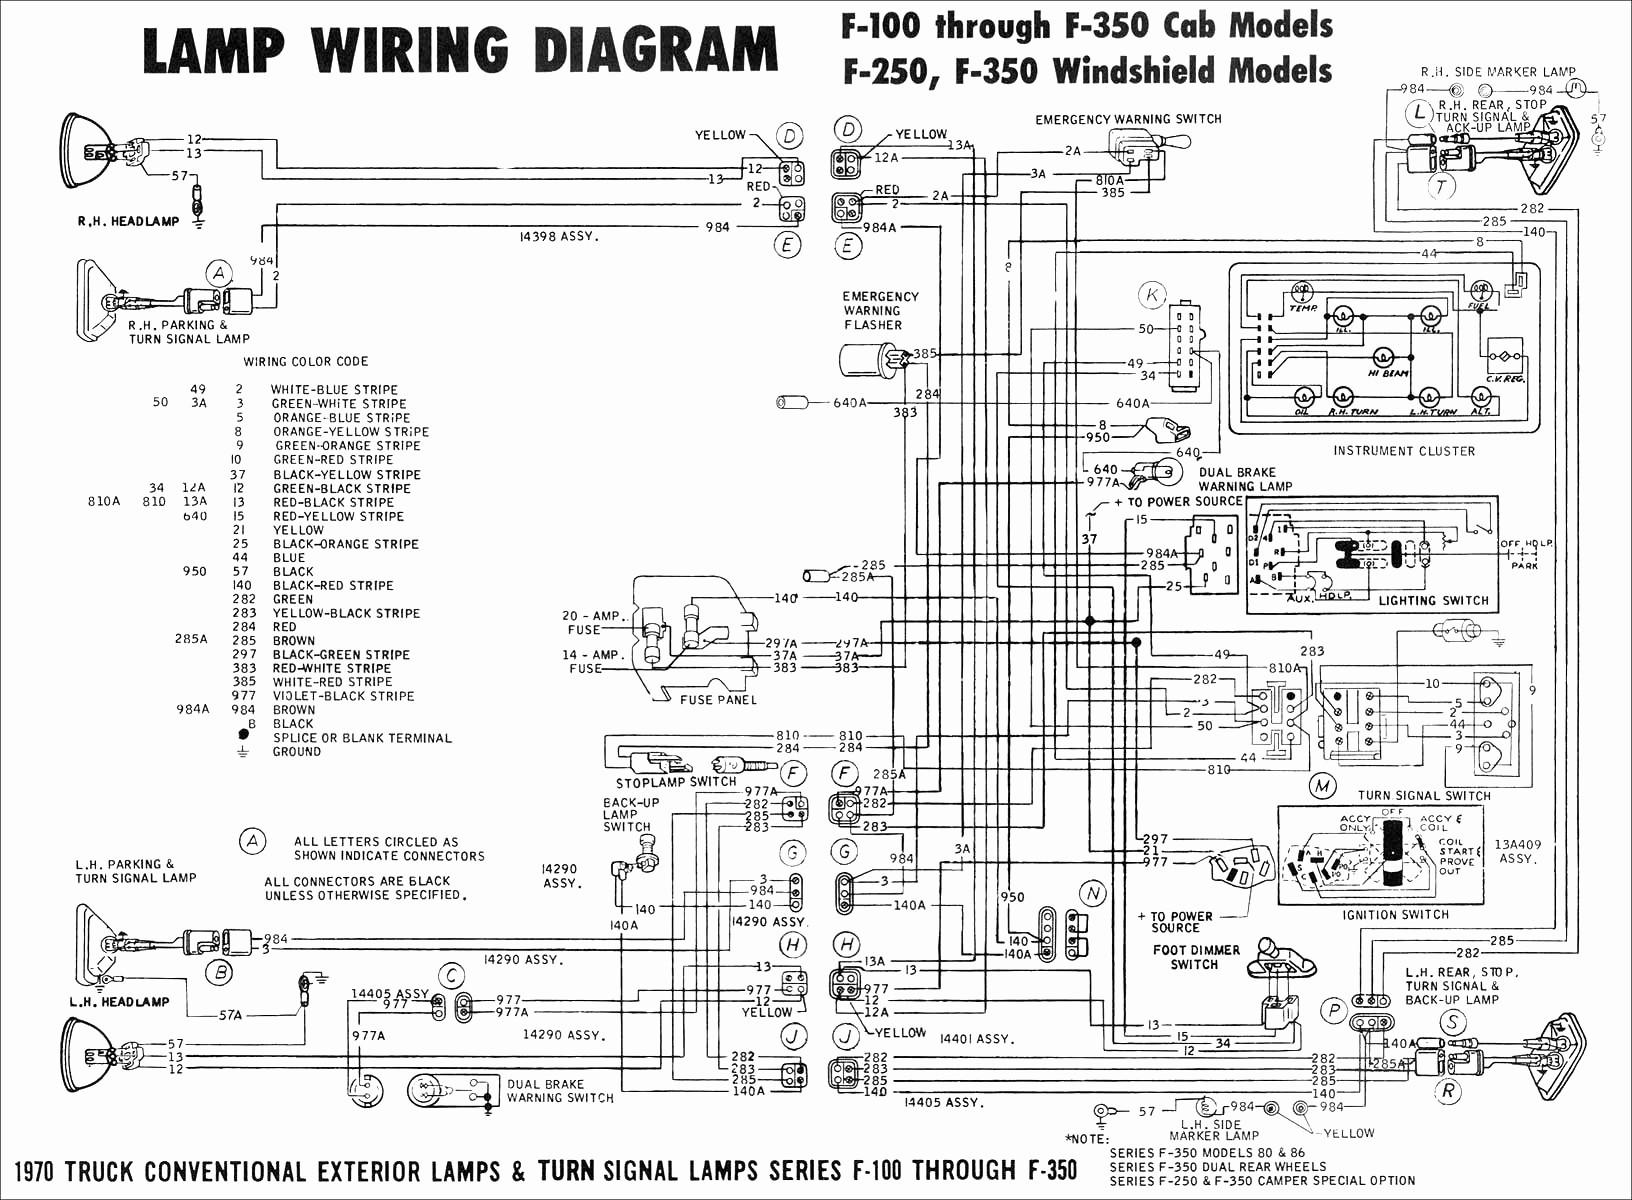 Directv Wiring Diagram whole Home Dvr Inspirational